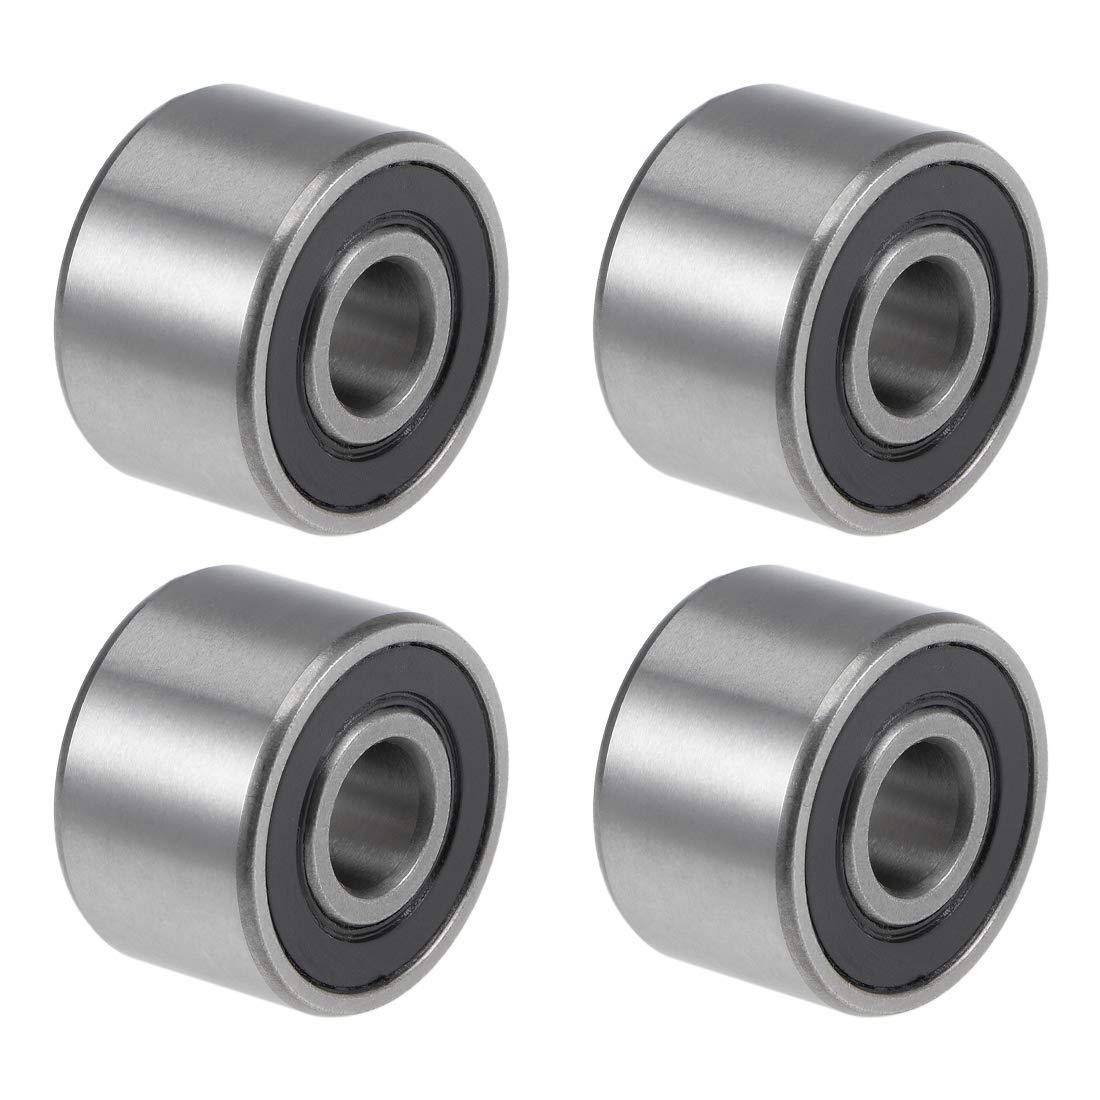 608-14-2RS Deep Groove Ball Bearings 8 mm Internal Diameter 22 mm OD 14 mm Internal Diameter Chrome Steel with Double Seal Z2 4 Pieces